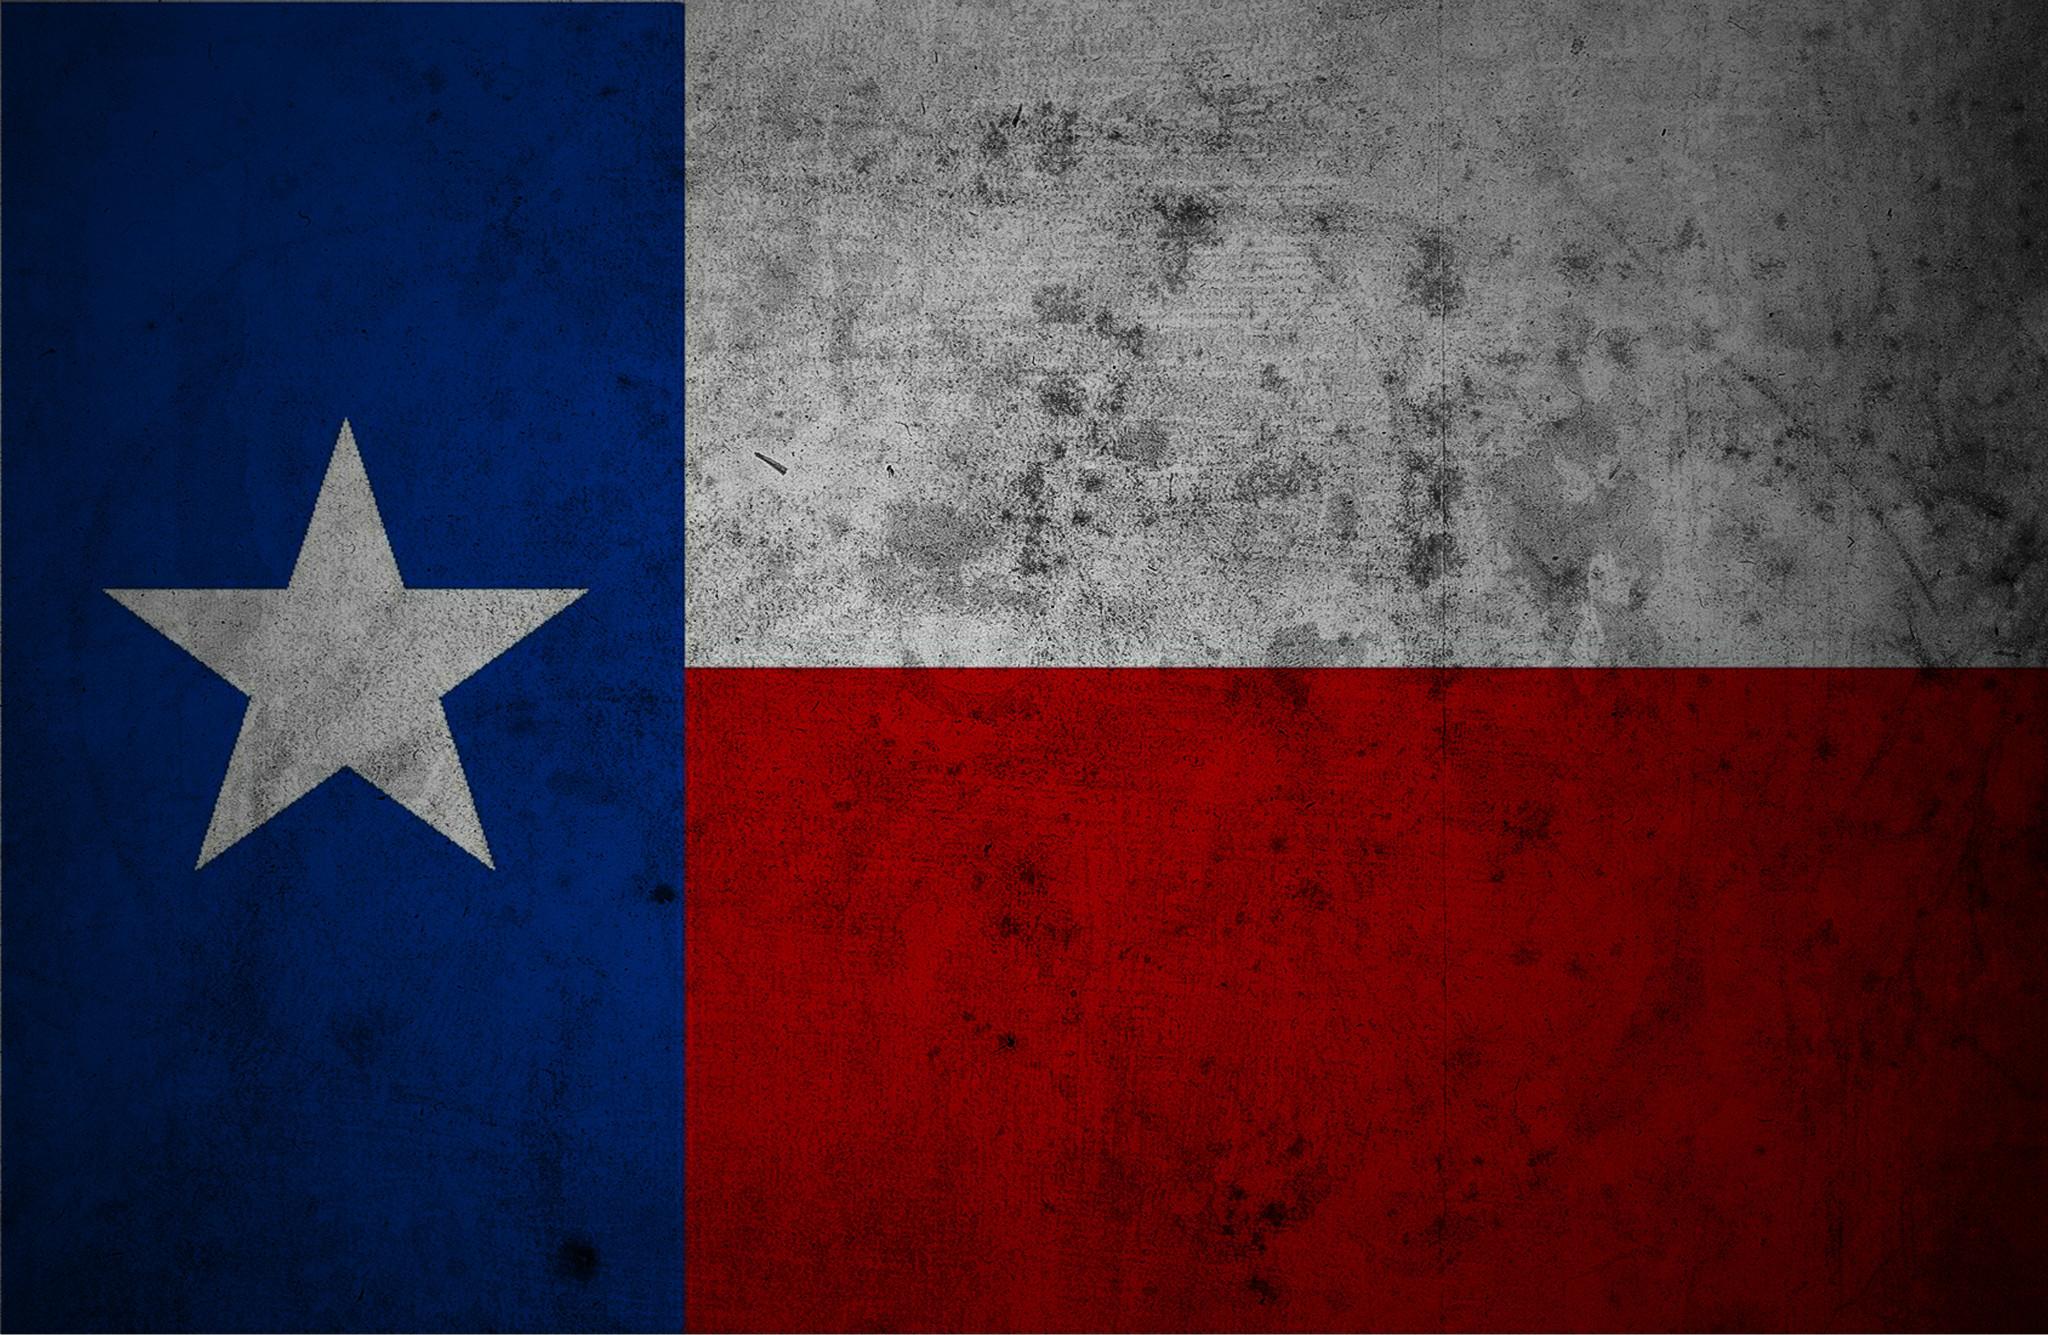 flags_texas_flag_desktop_3000x1955_hd-wallpaper-740450.jpg